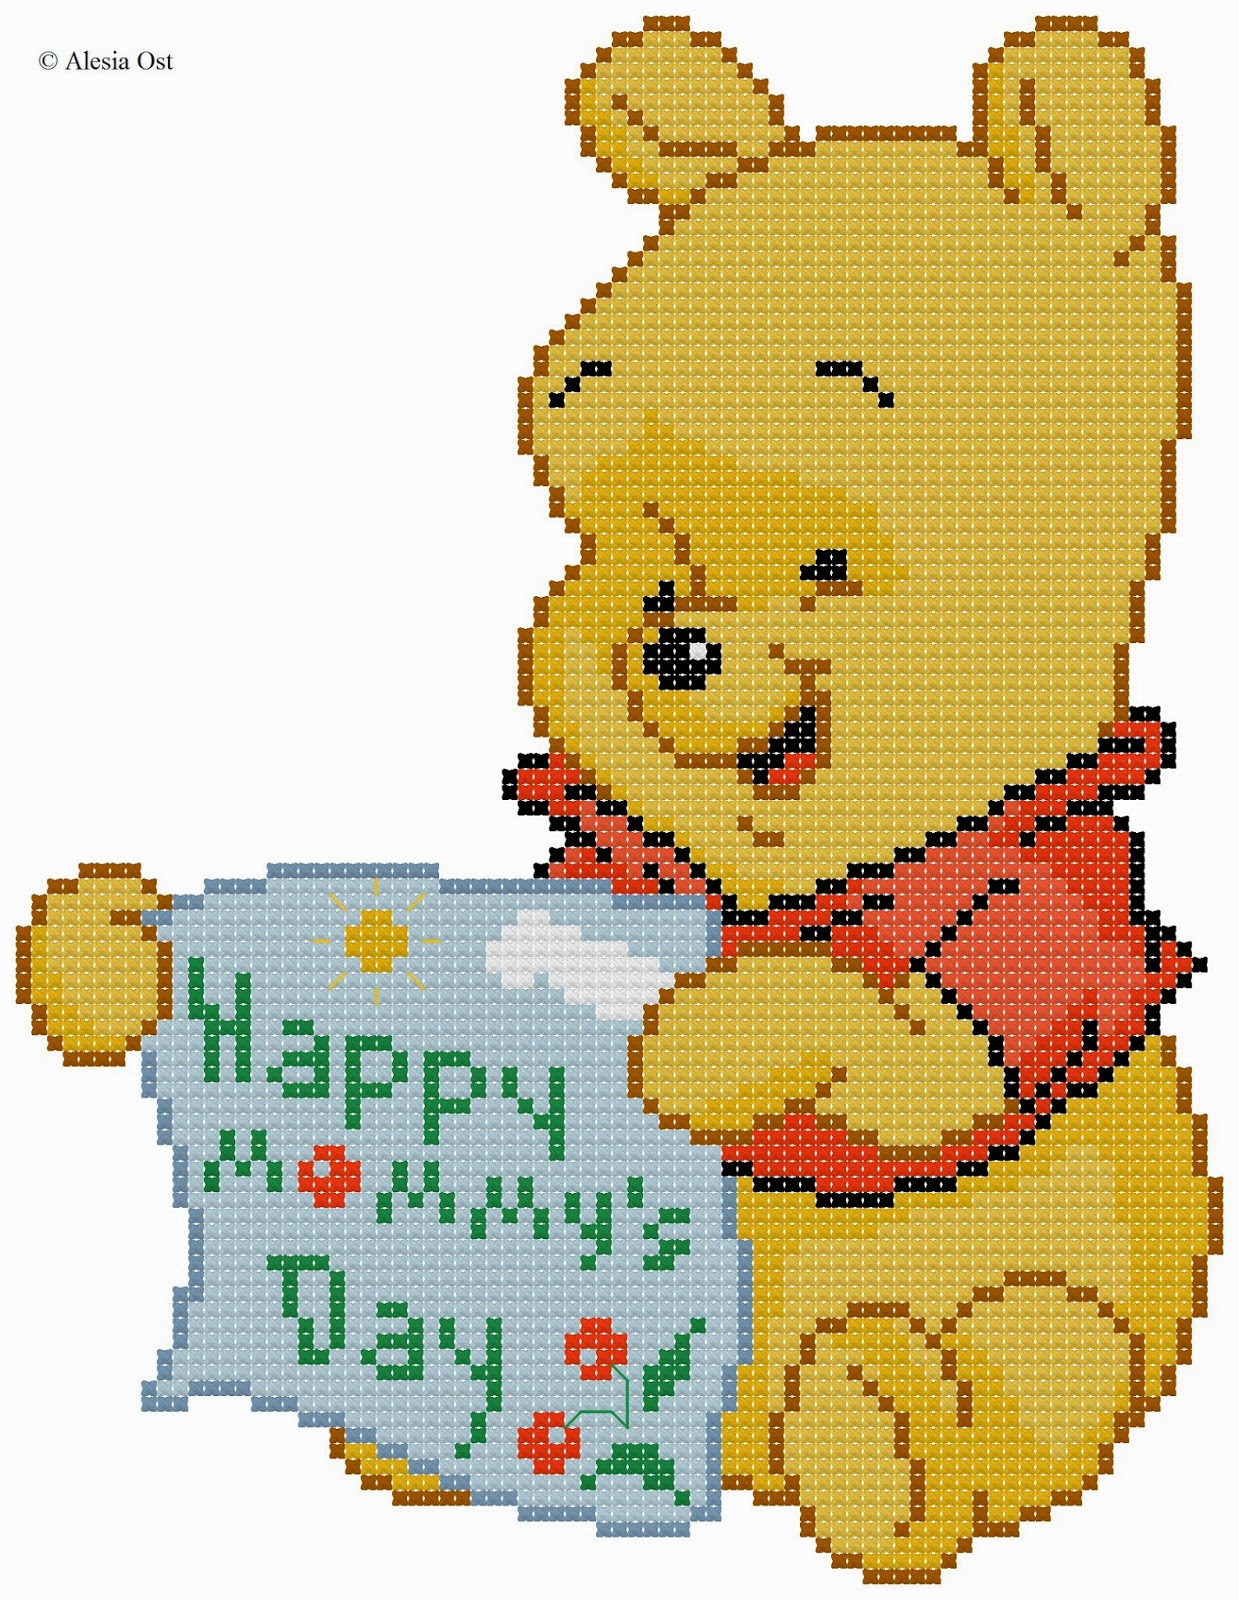 Free cross-stitch patterns, Winnie the Pooh, Disney, cartoon, bear, animal, Mother's Day, holiday, cross-stitch, back stitch, cross-stitch scheme, free pattern, x-stitchmagic.blogspot.it, вышивка крестиком, бесплатная схема, punto croce, schemi punto croce gratis, DMC, blocks, symbols